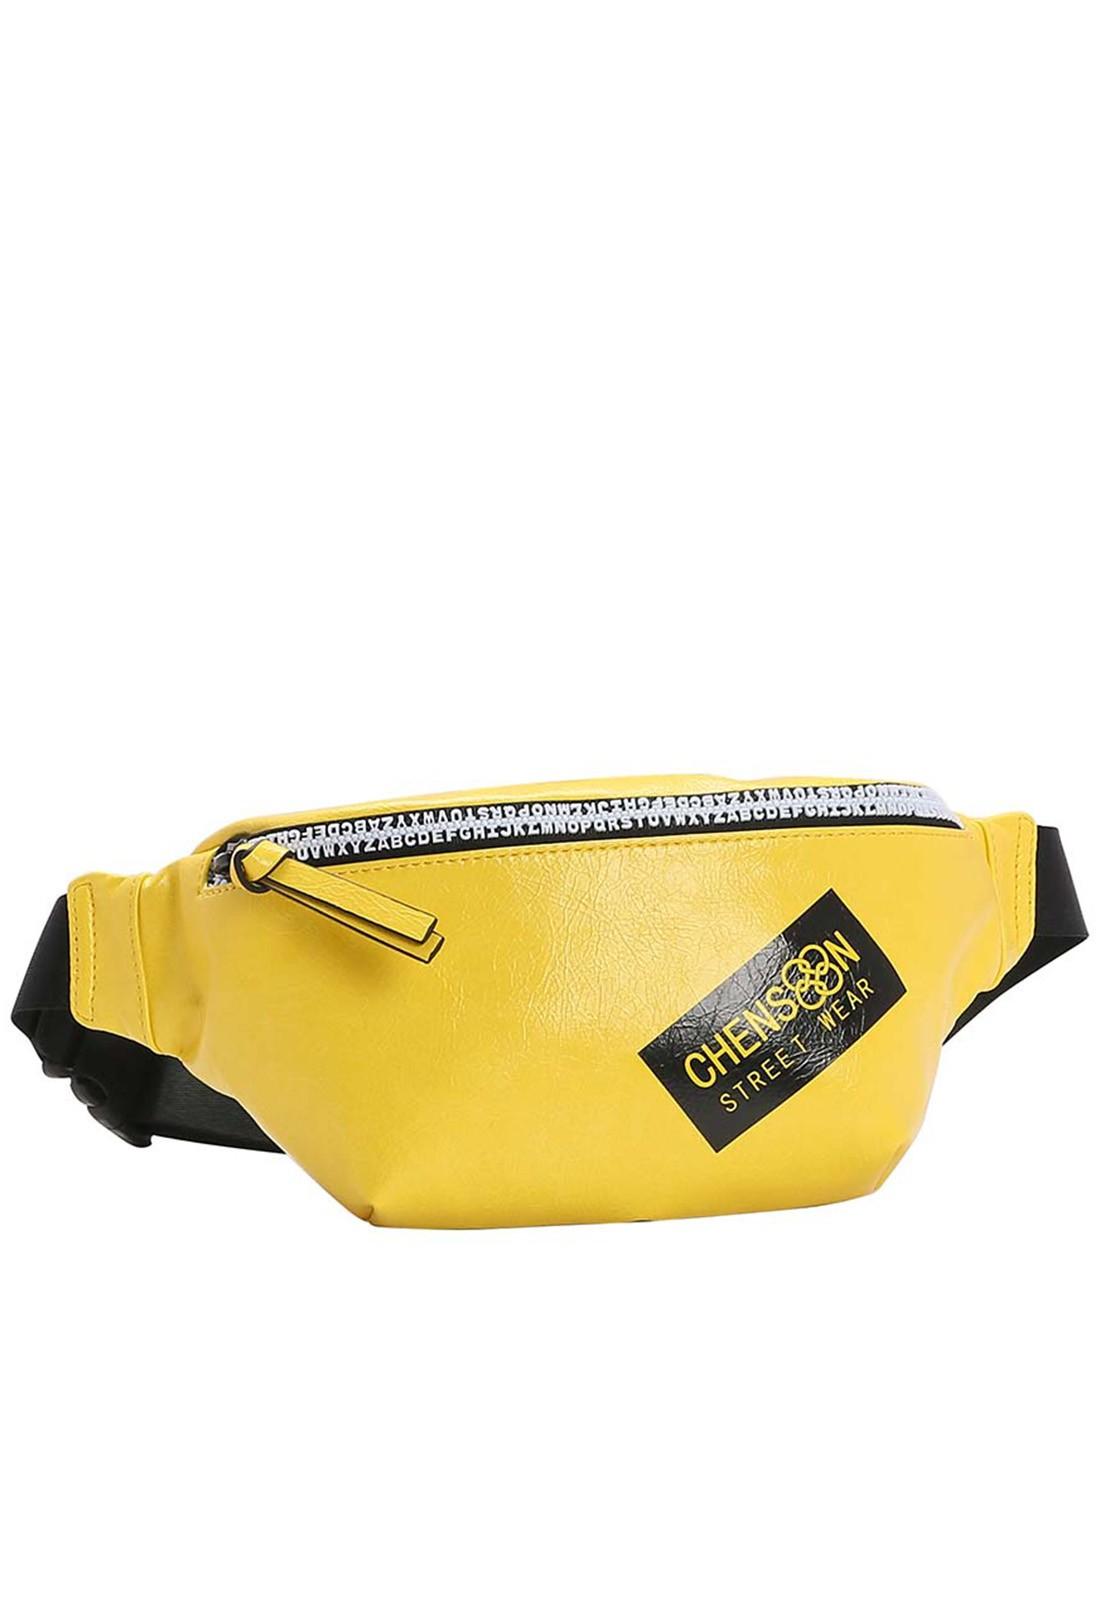 Pochete Feminina Streetwear de Mão 1482998